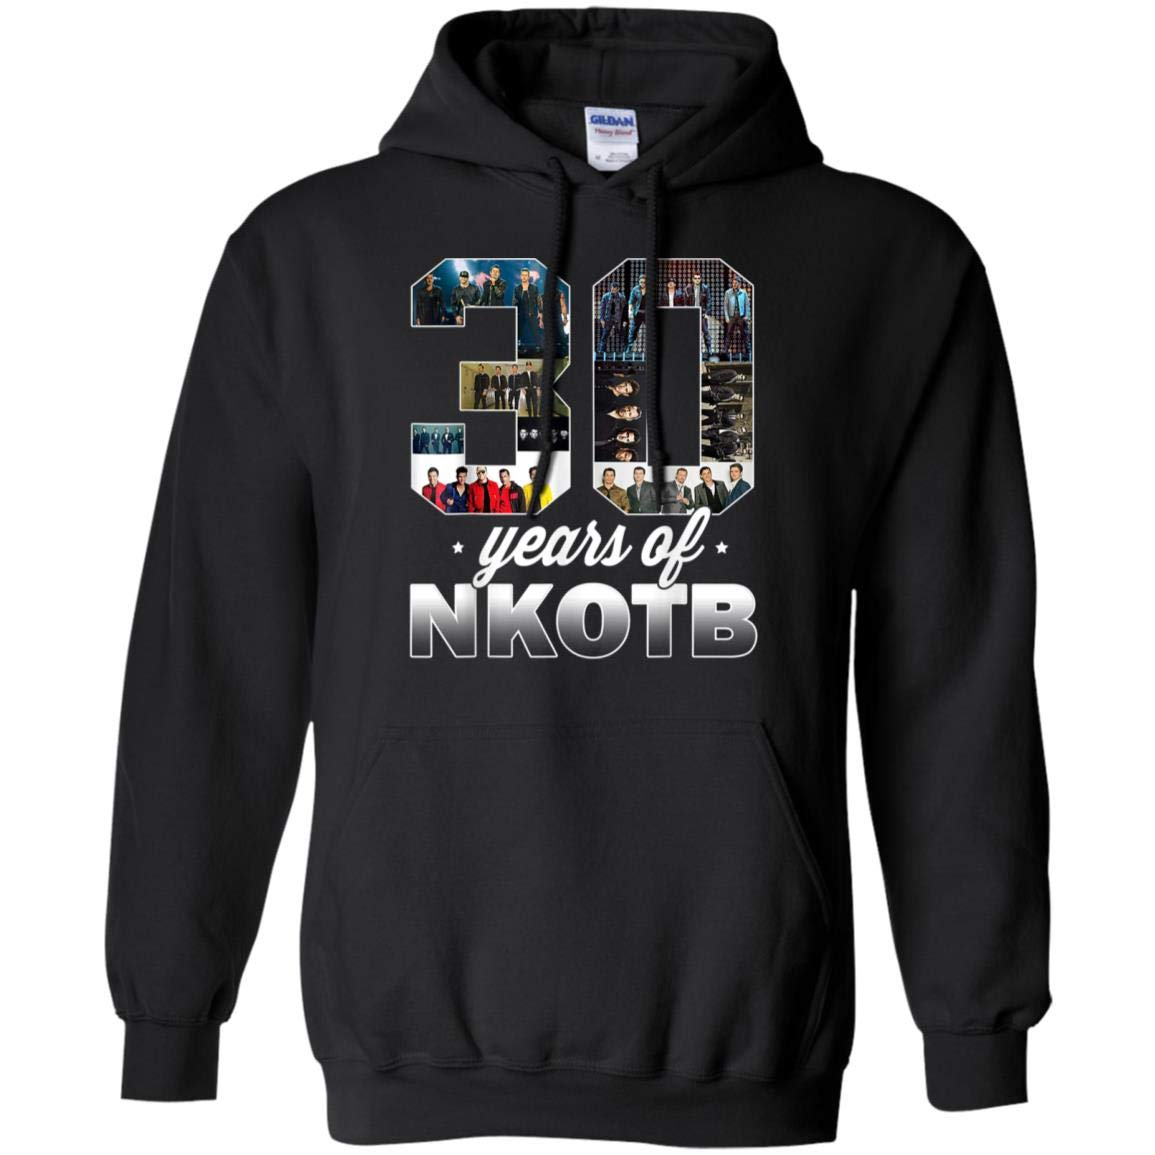 Halidy The New Giftmixtape Tour2019 Tshirt Black4